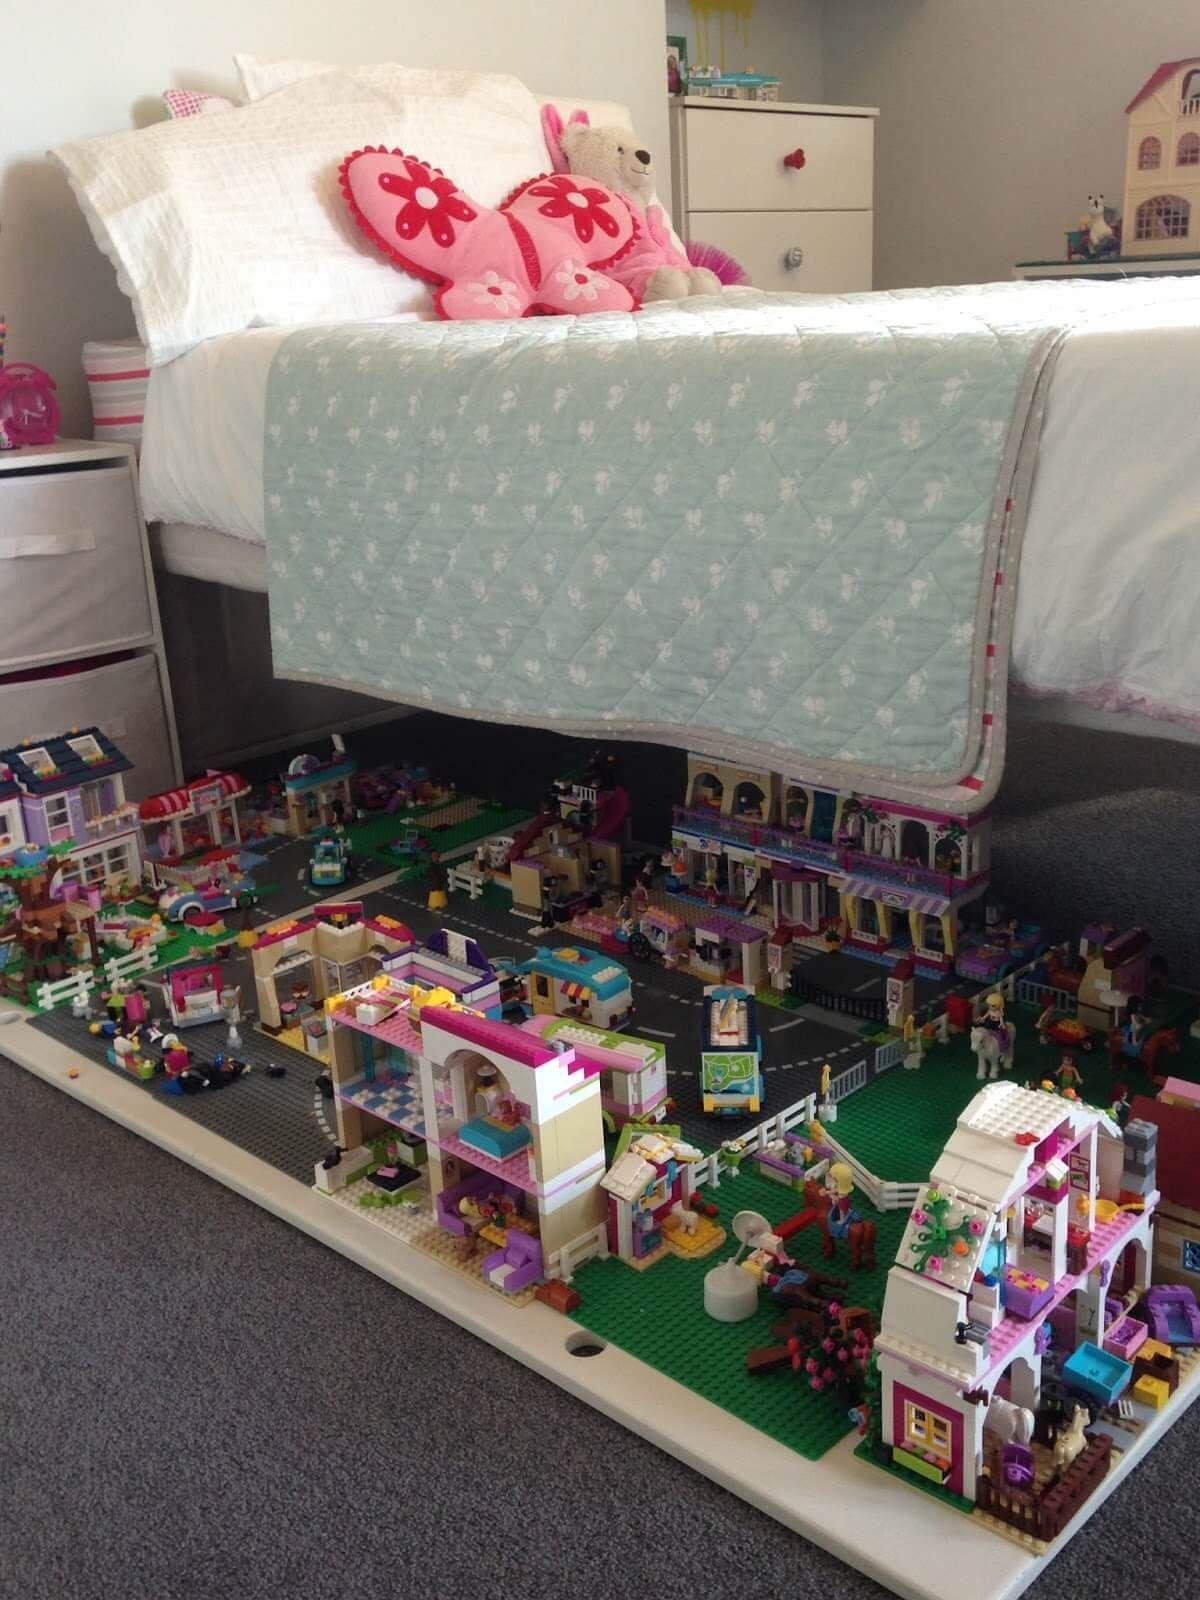 LEGO Storage Ideas To Keep Your Bricks Organized